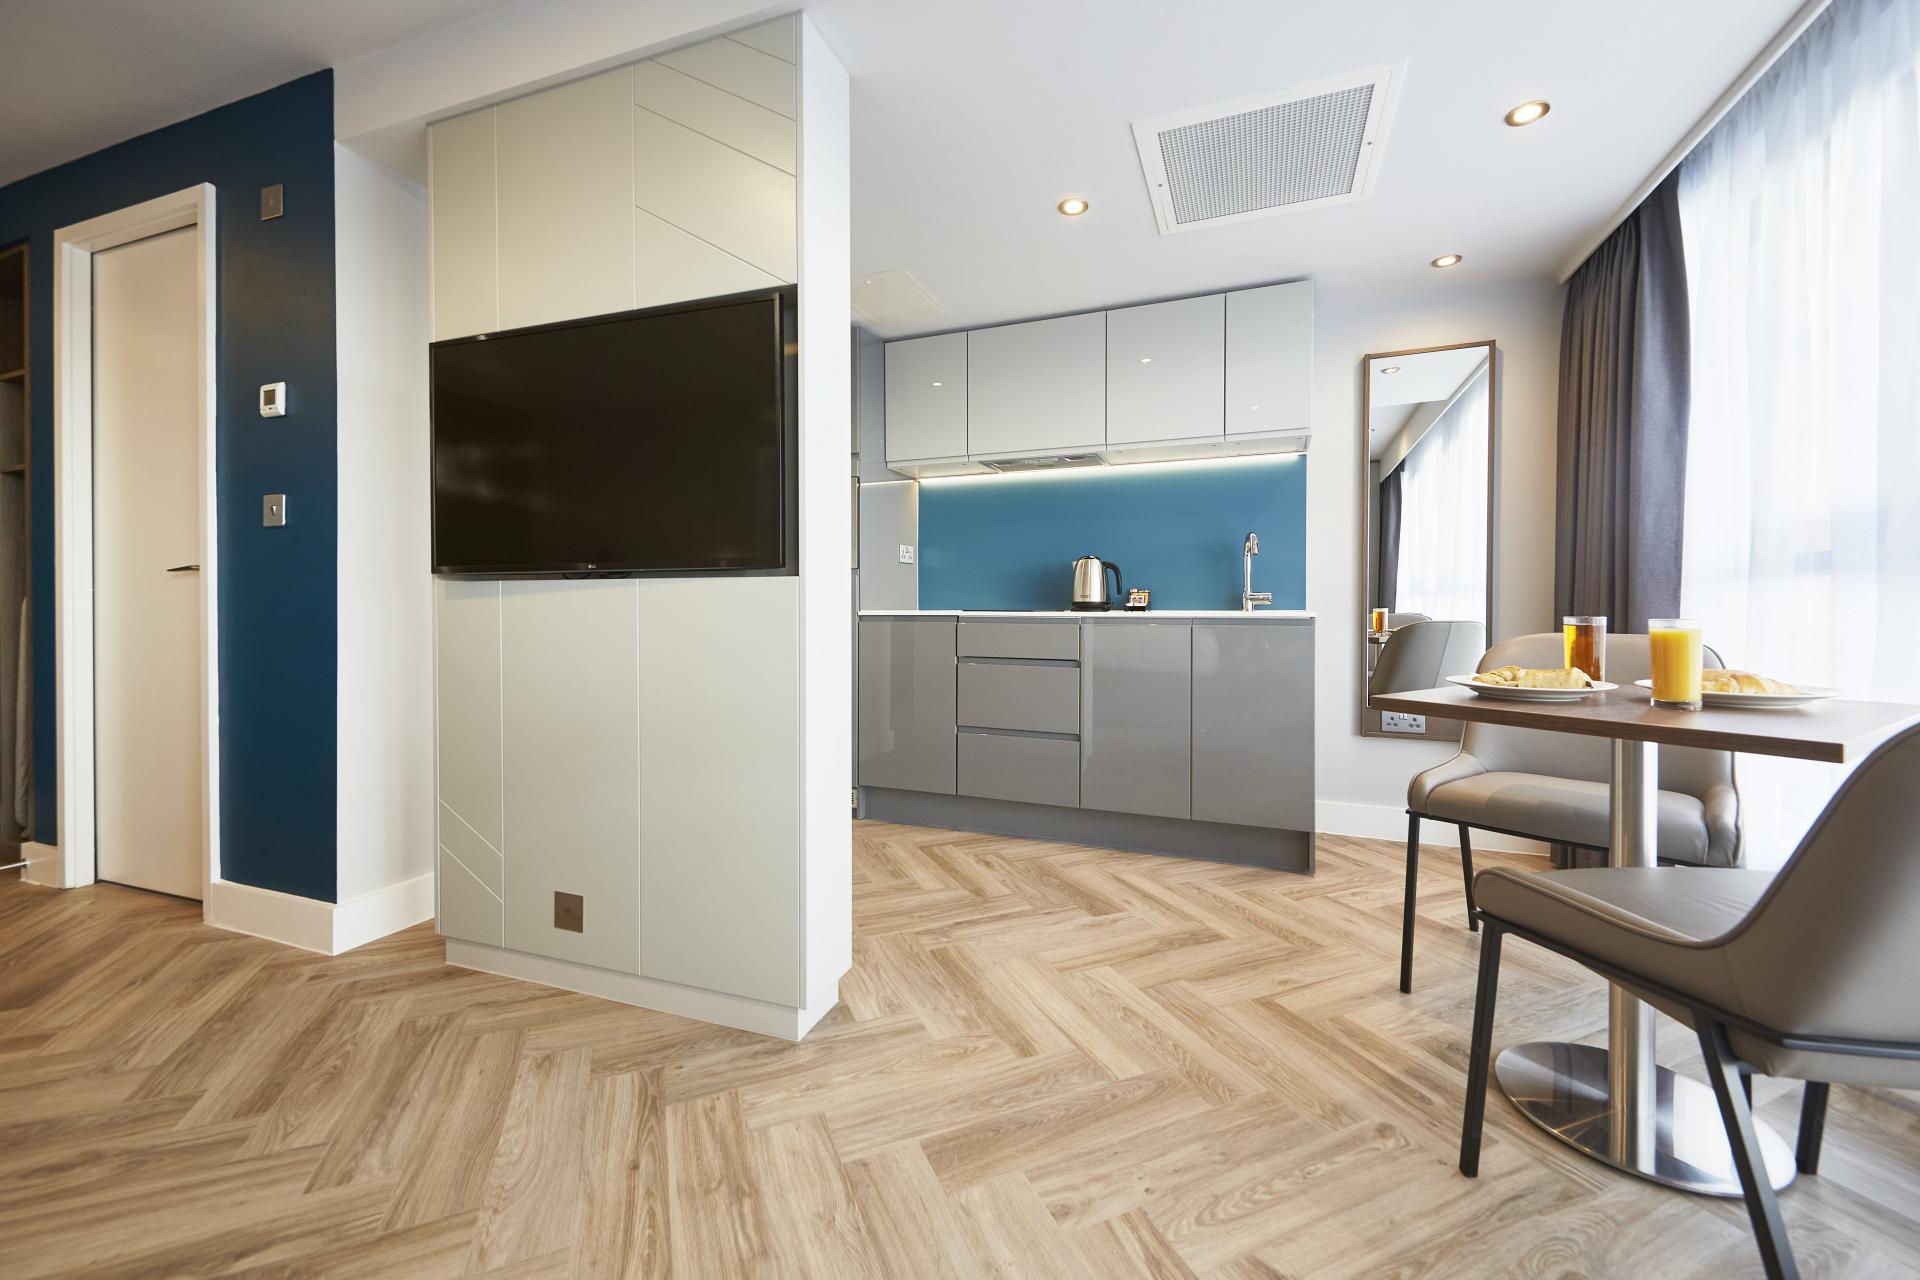 Dezign studio at Roomzzz Newcastle City Apartments - Citybase Apartments